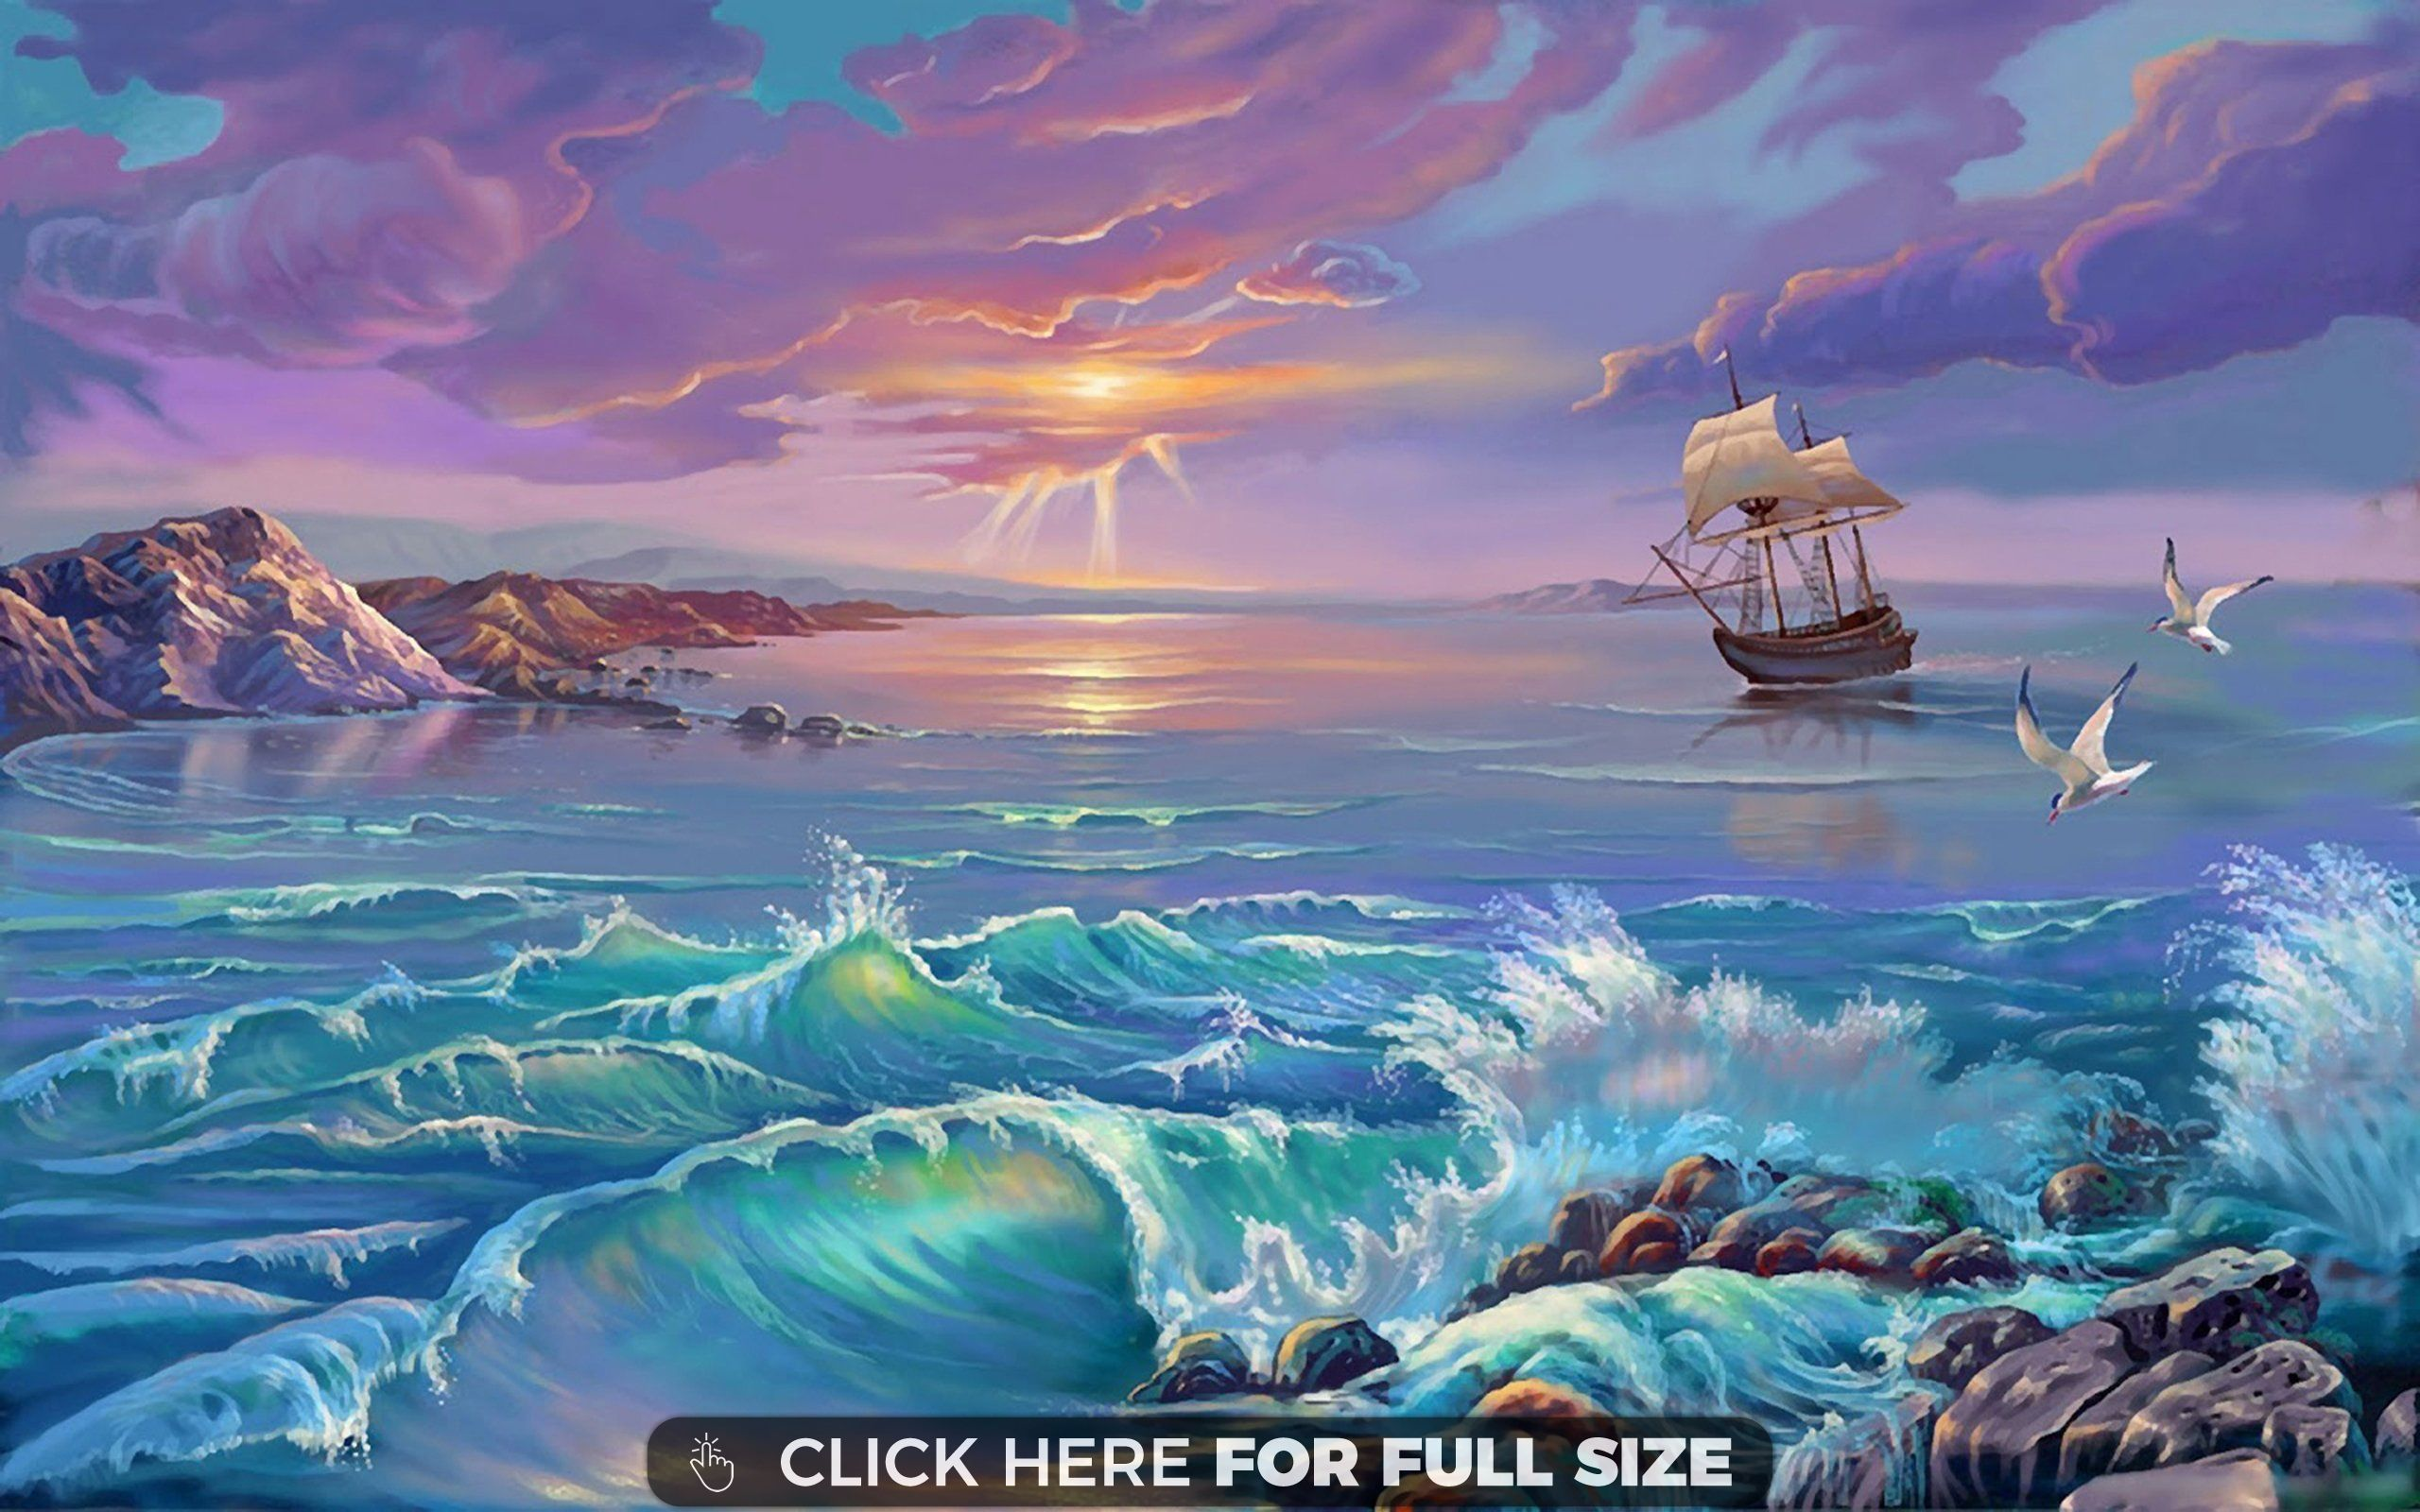 Landscape Nature Lake Bans Boat Birds Clouds Art Wallpaper Art Wallpaper Cloud Art Artwork Painting